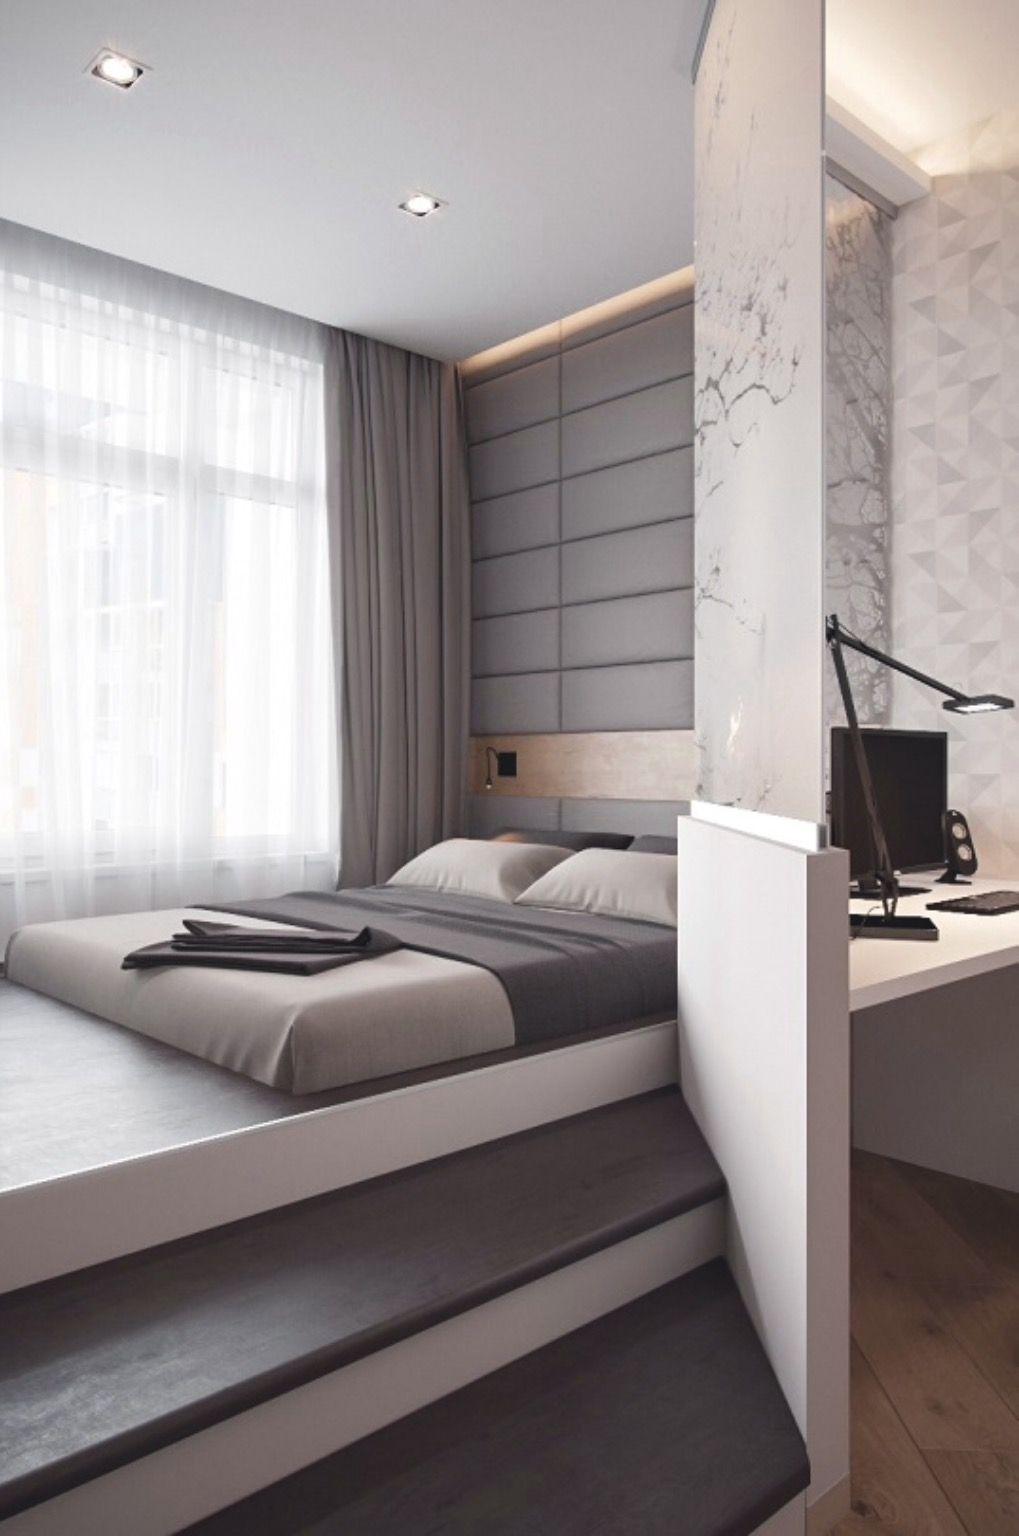 Bedrooms Pin by Marisha Gustavo on Bedrooms